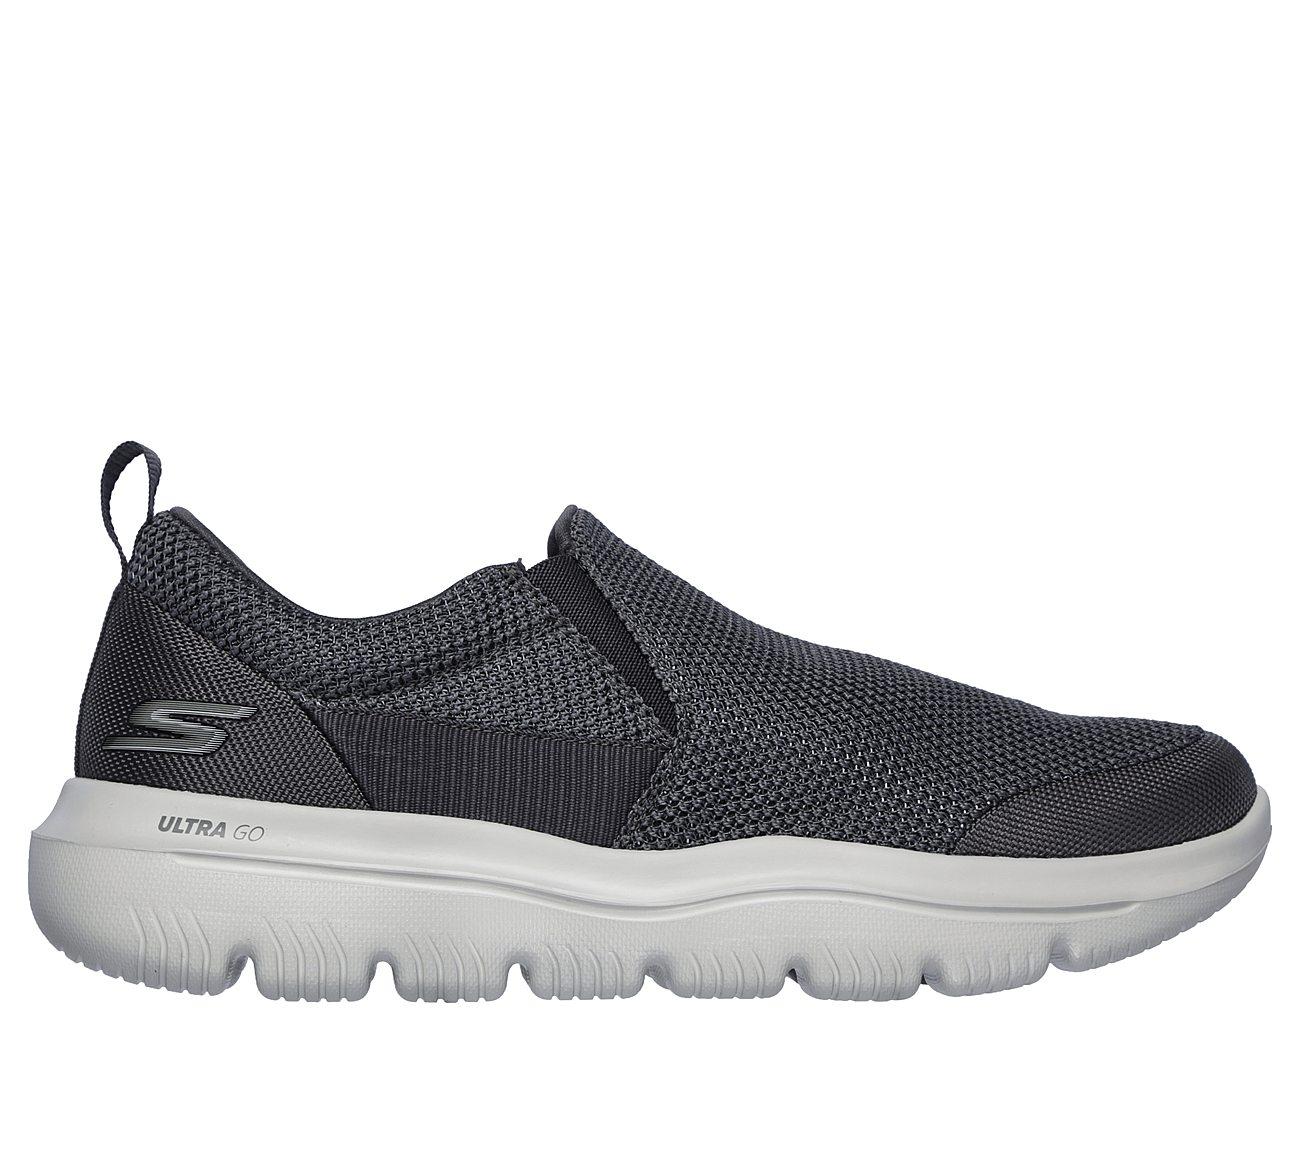 go skechers shoes